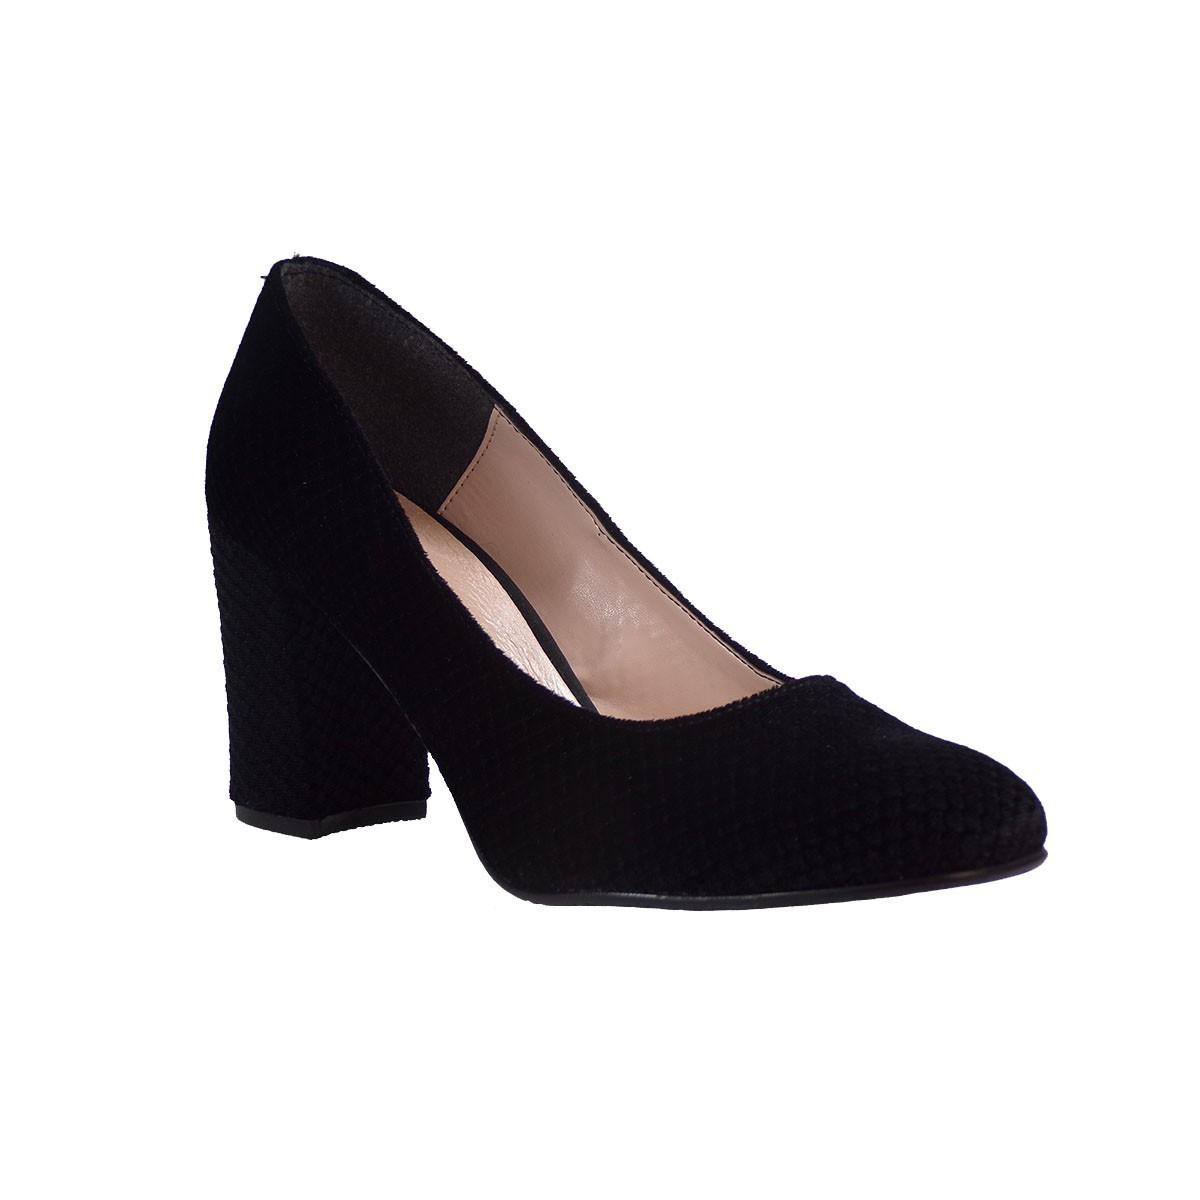 KATIA SHOES Γυναικεία Παπούτσια Γόβες ΓΟΒΑ/1785 Mαύρο Λέπι